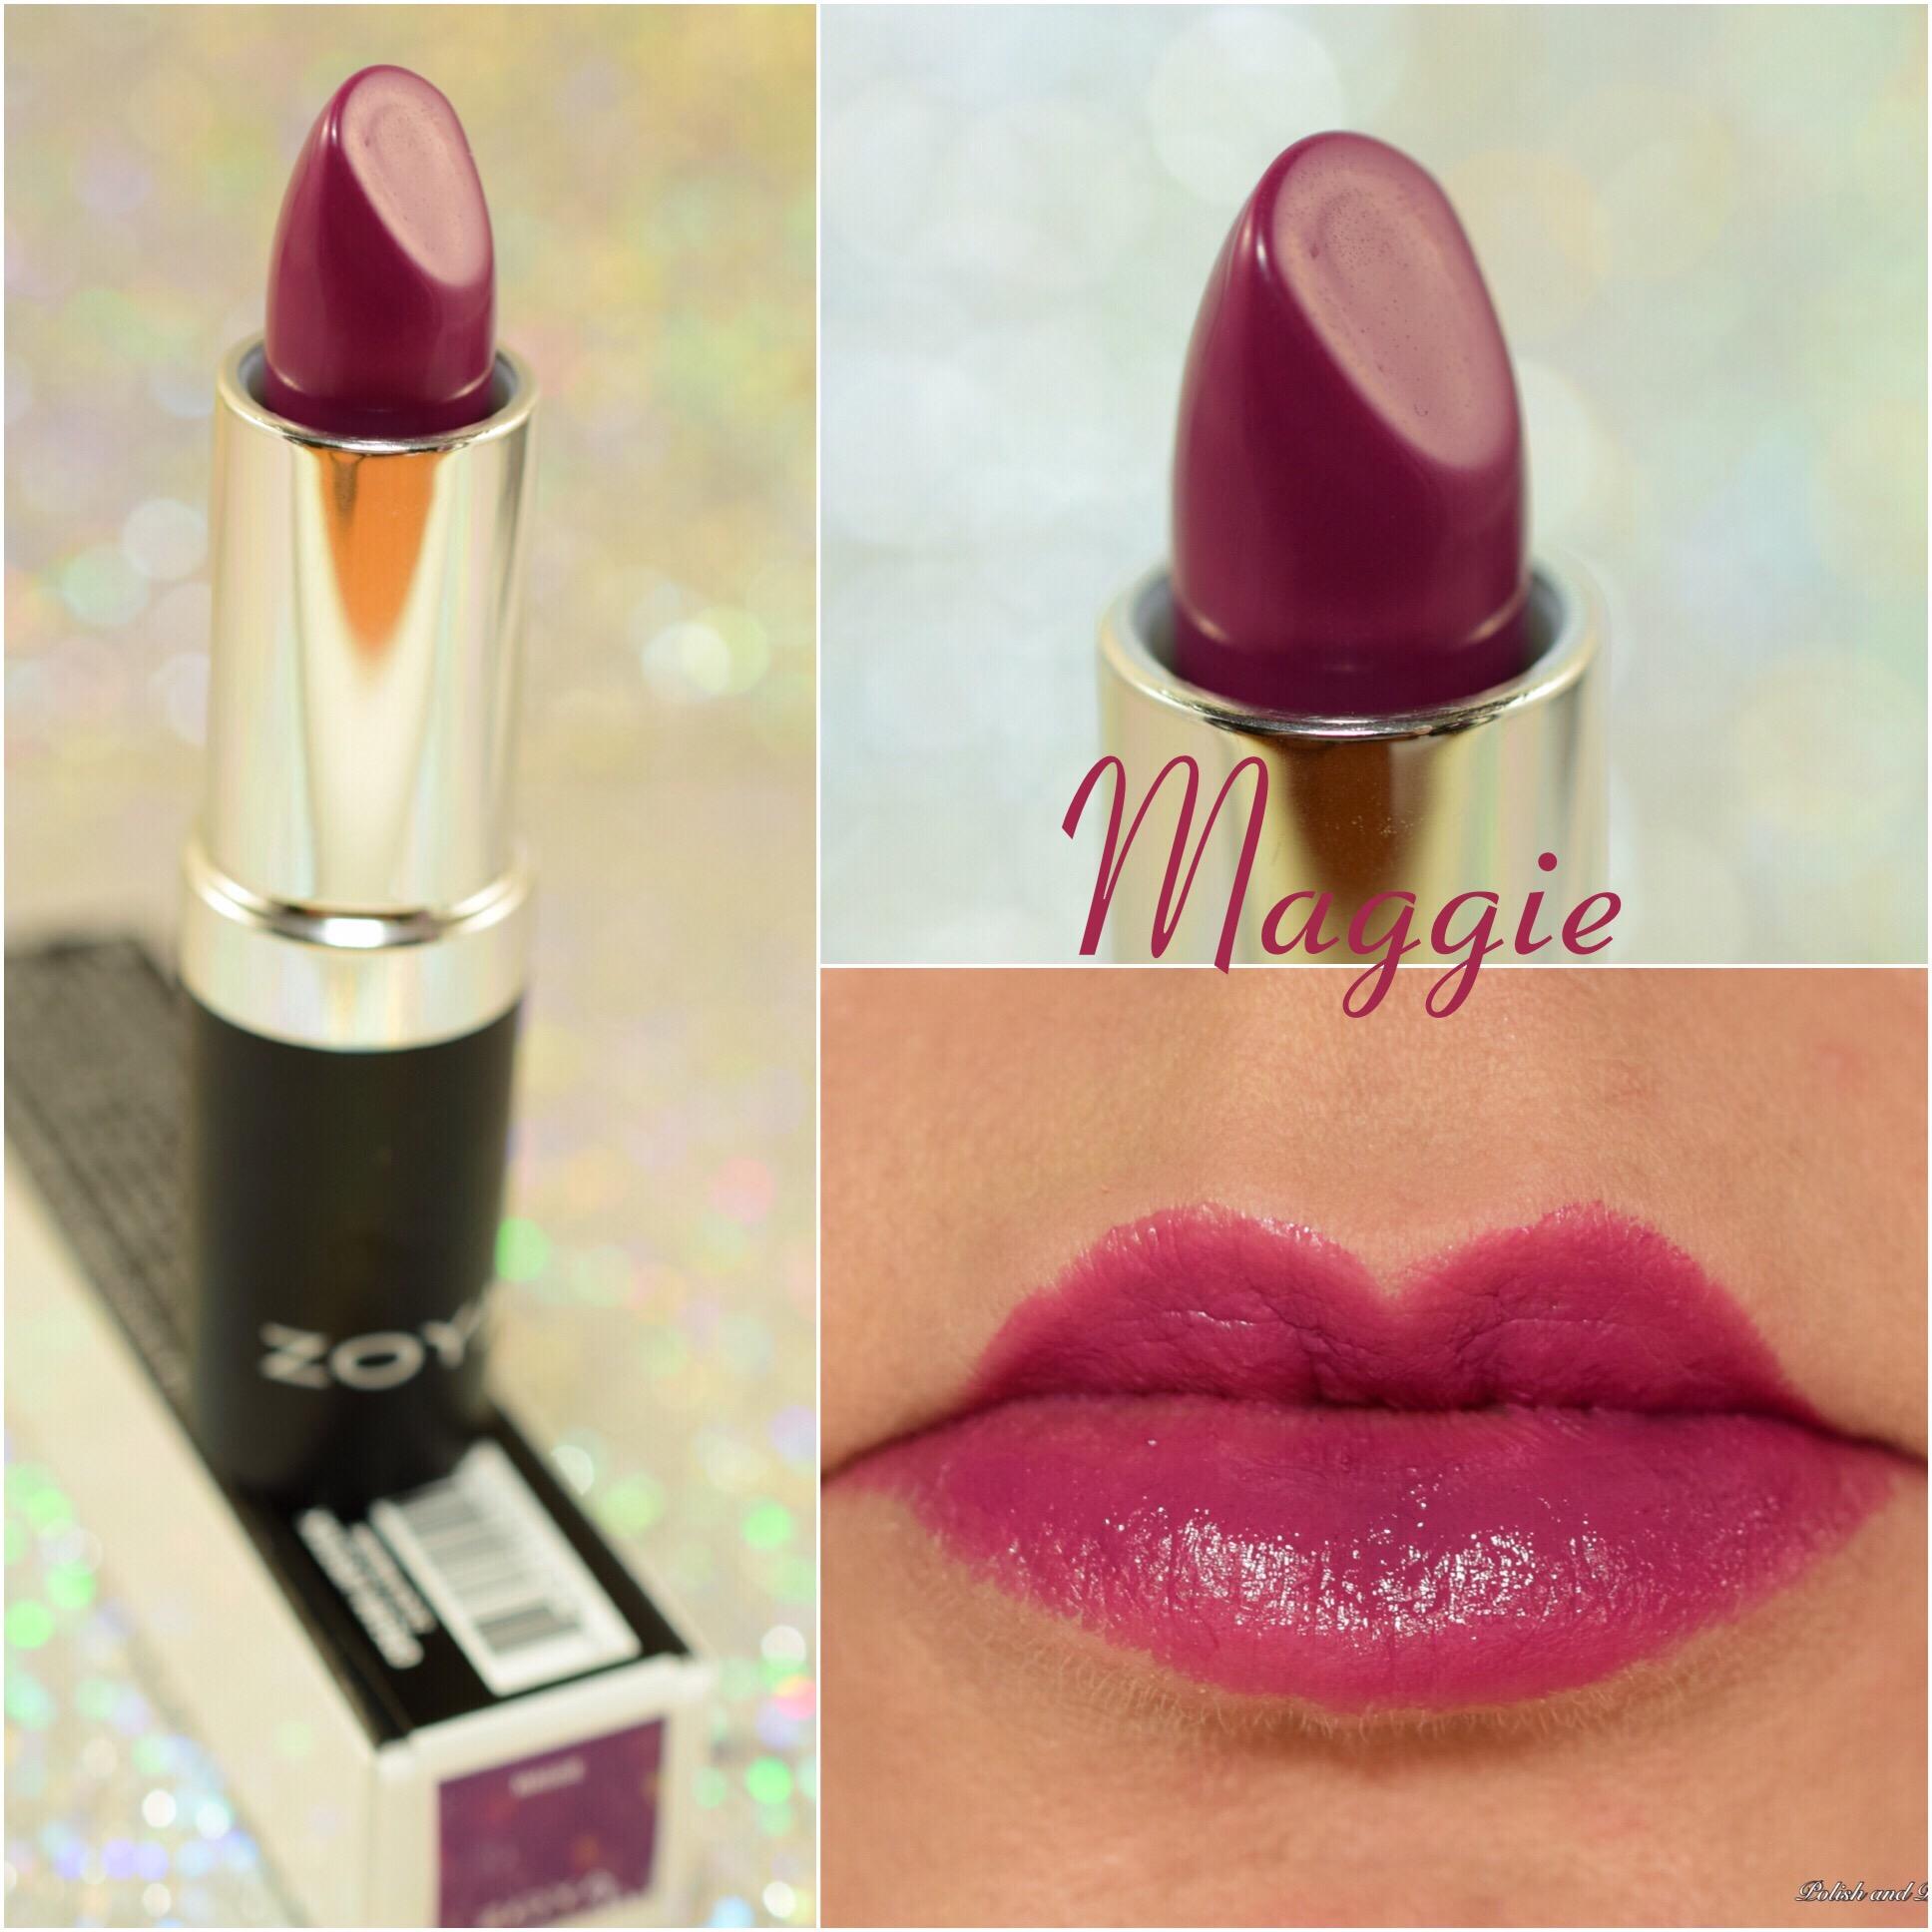 Zoya Maggie Lipstick